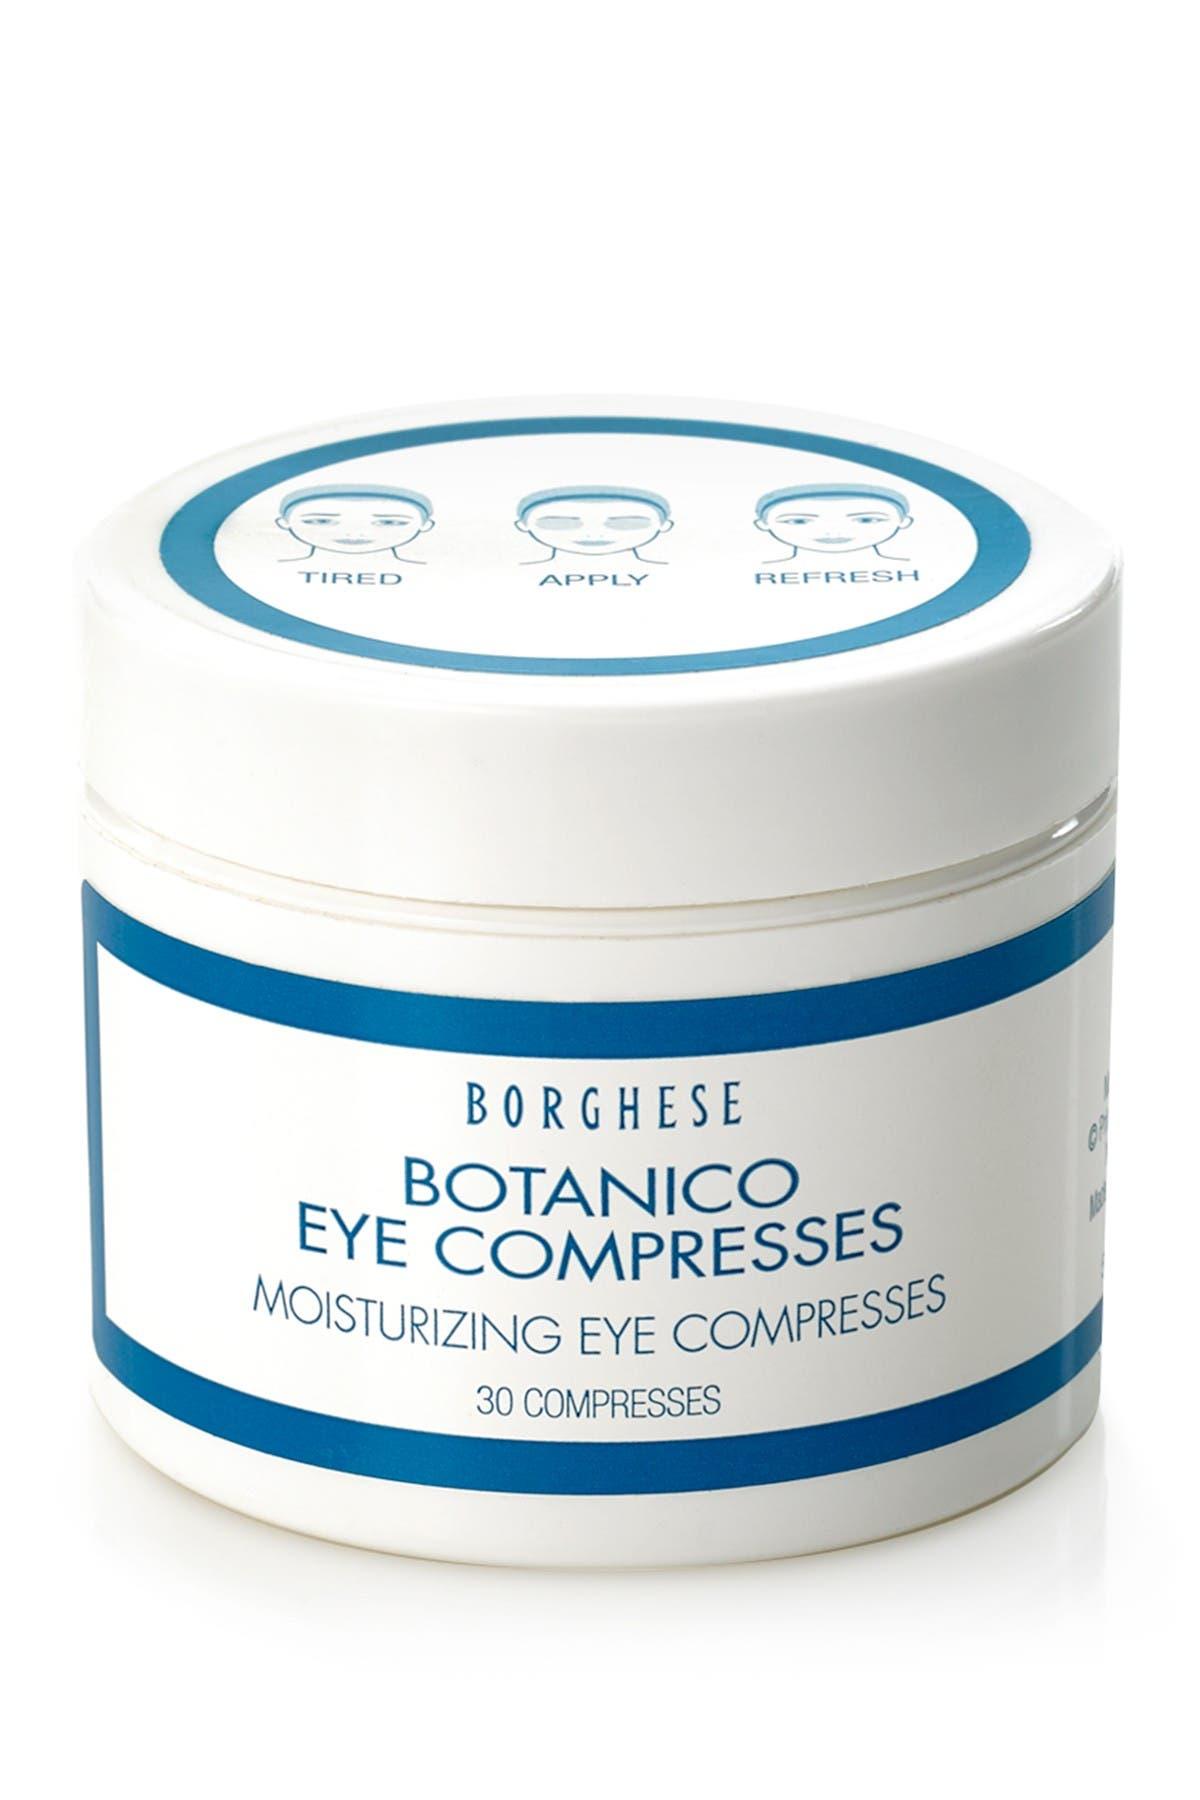 Image of Borghese Botanico Eye Compresses - 30 count